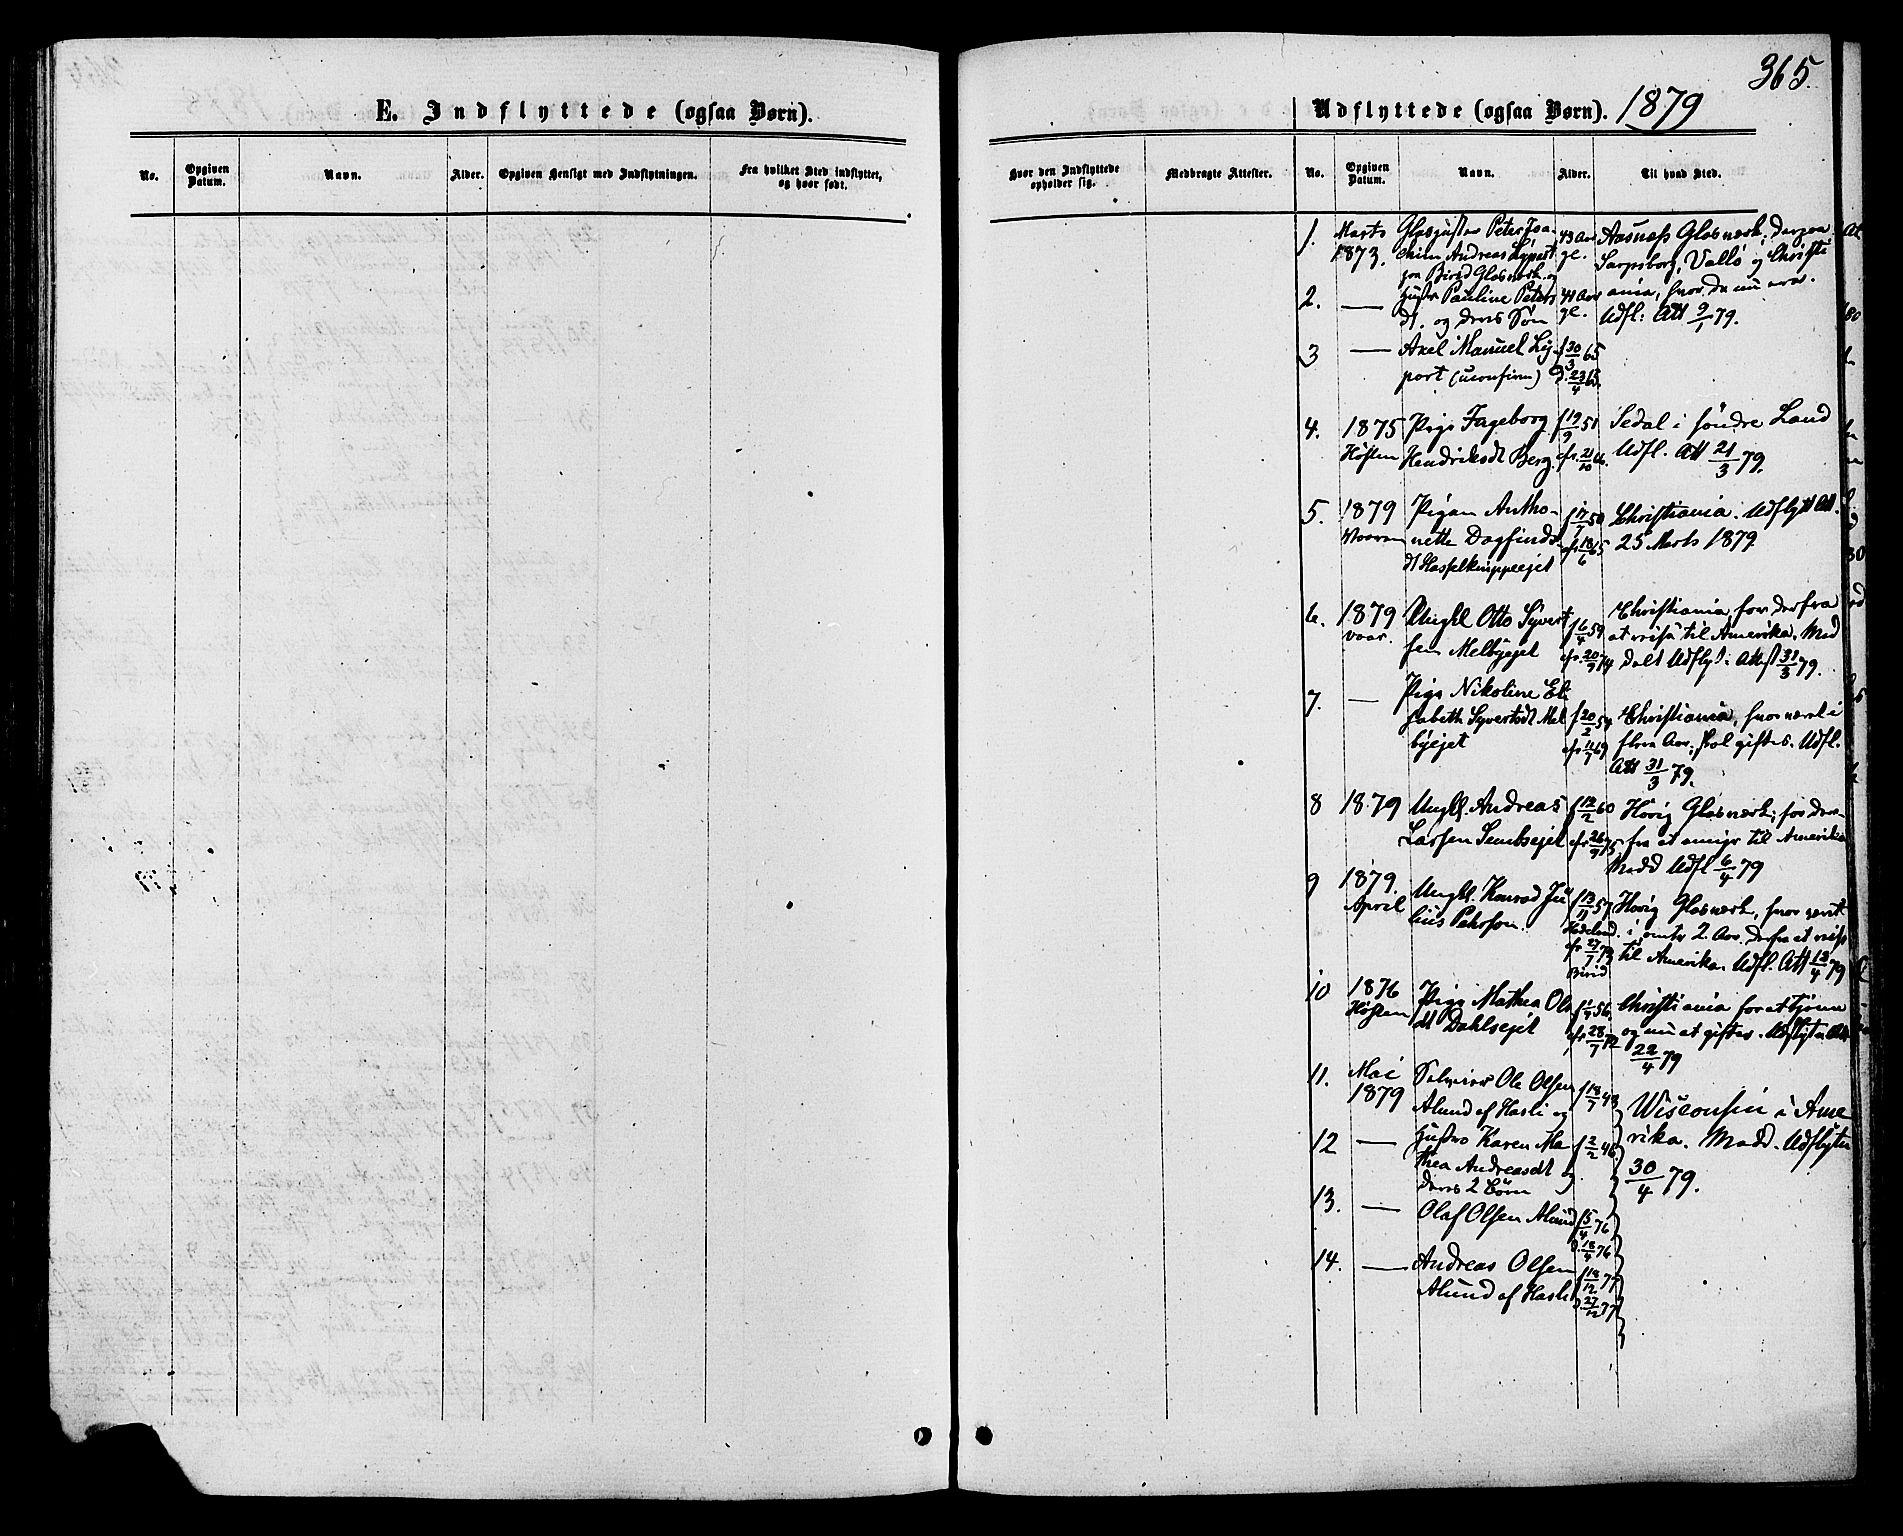 SAH, Biri prestekontor, Ministerialbok nr. 6, 1877-1886, s. 365